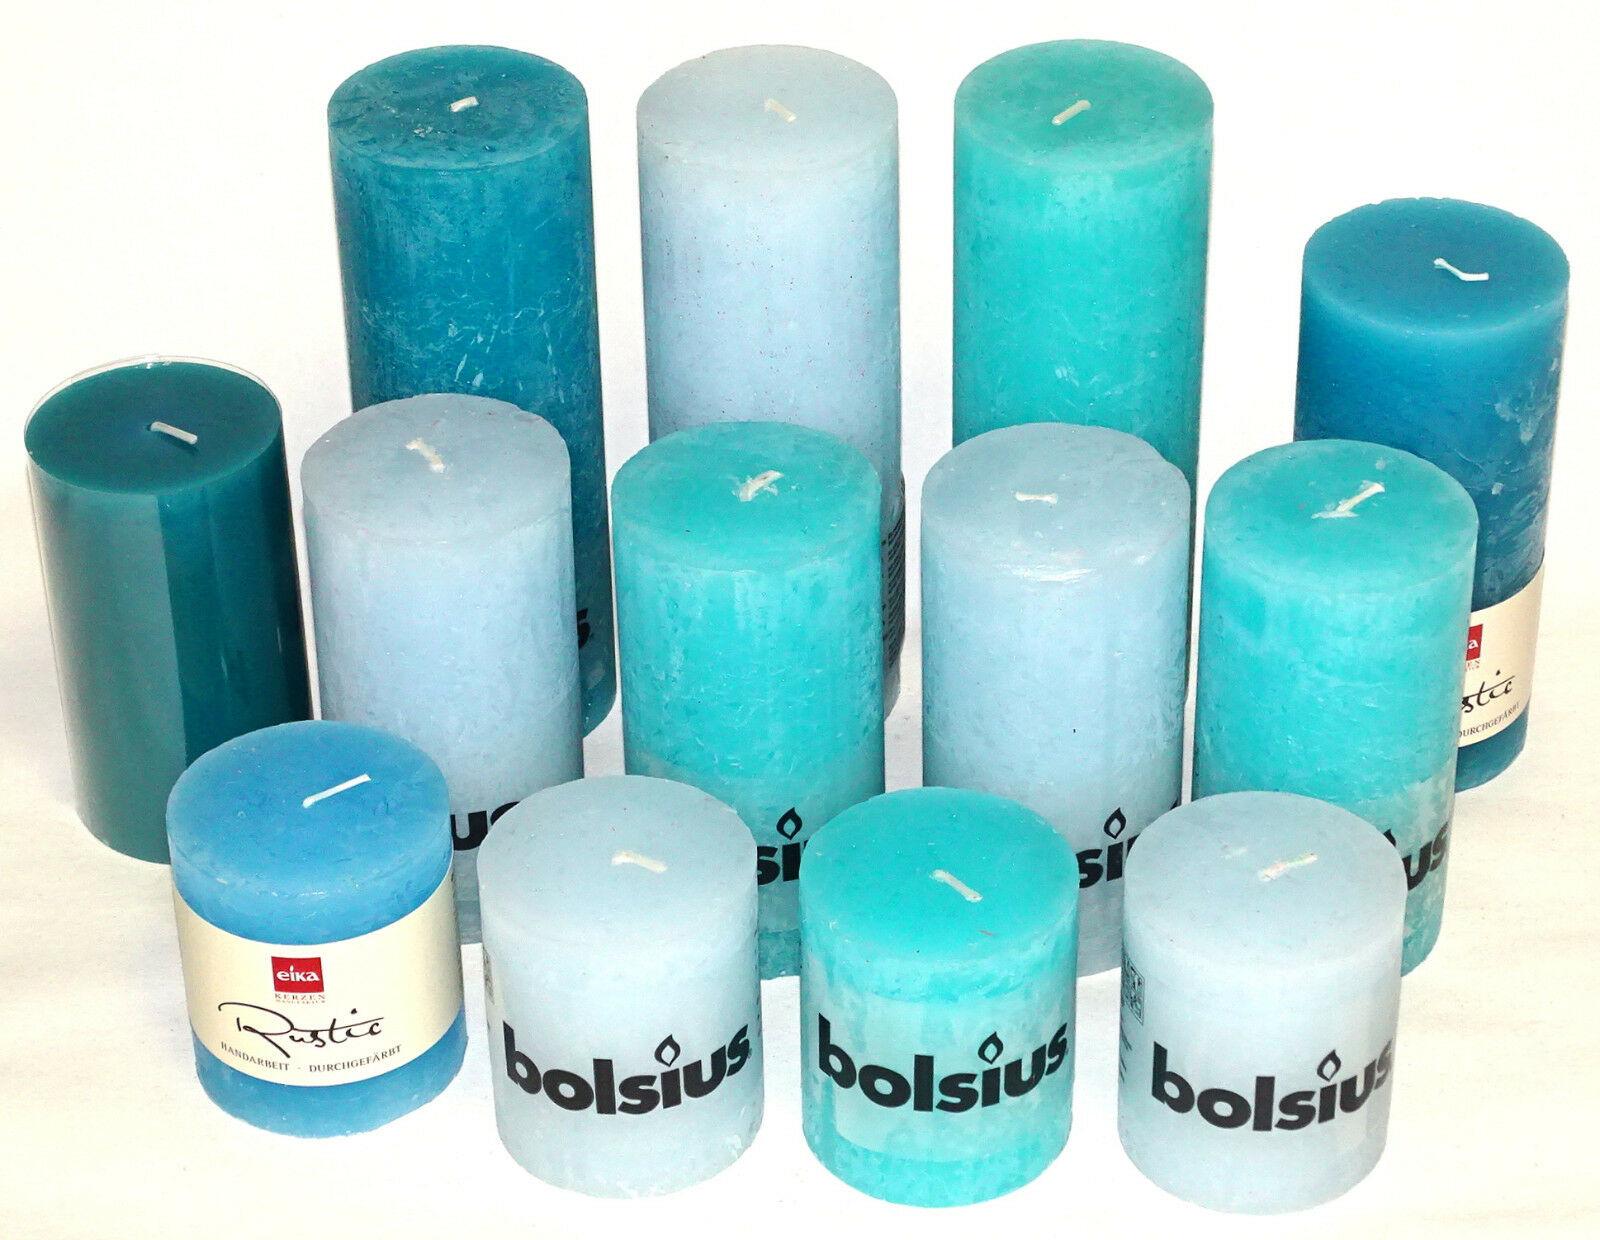 5 kg Rustic Stumpenkerzen Set Paket Kerzen Rustik gemischt nach Farben Tischdeko - Blau-Türkis 01